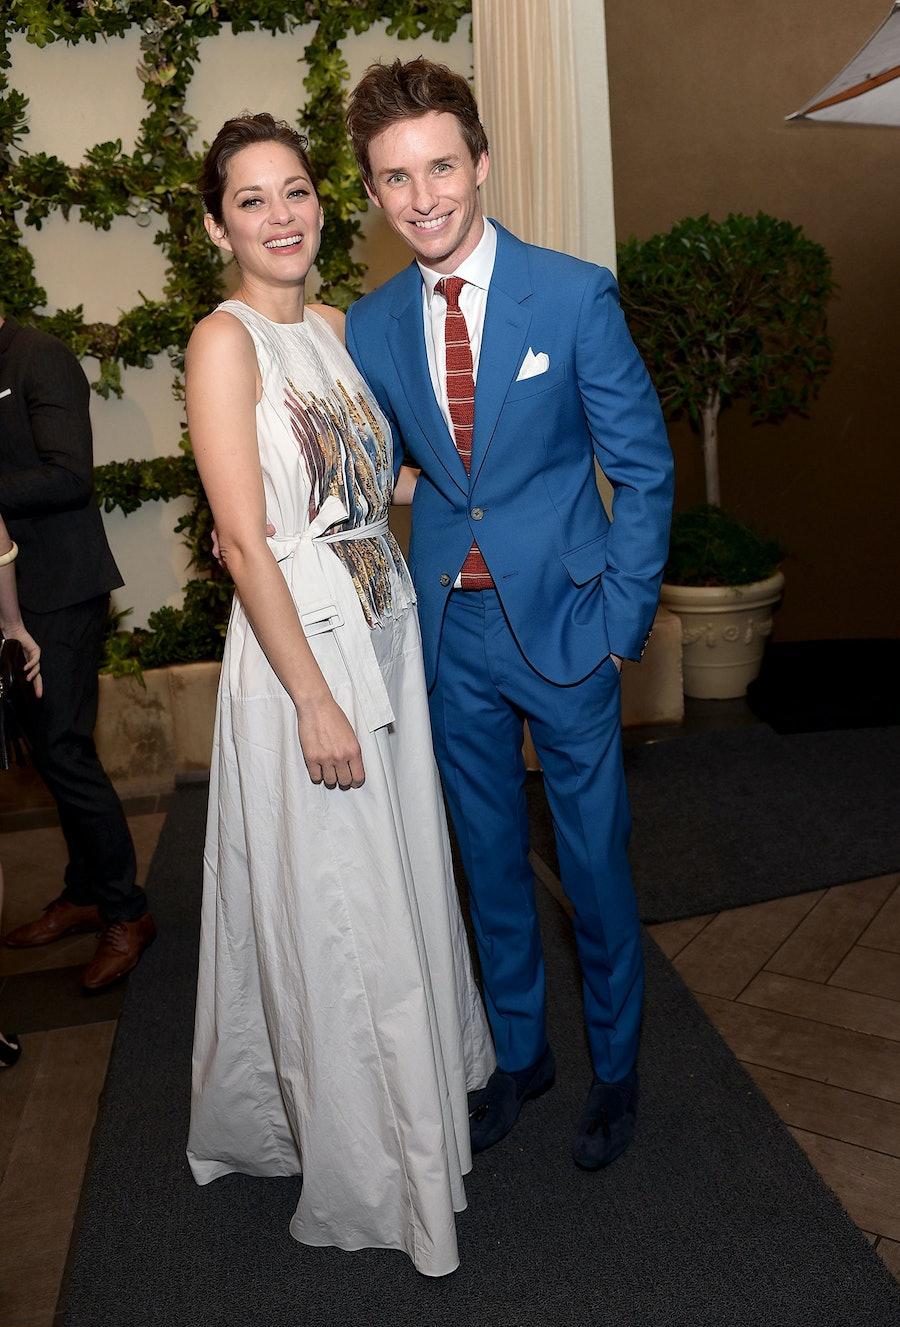 Marion Cotillard and Eddie Redmayne